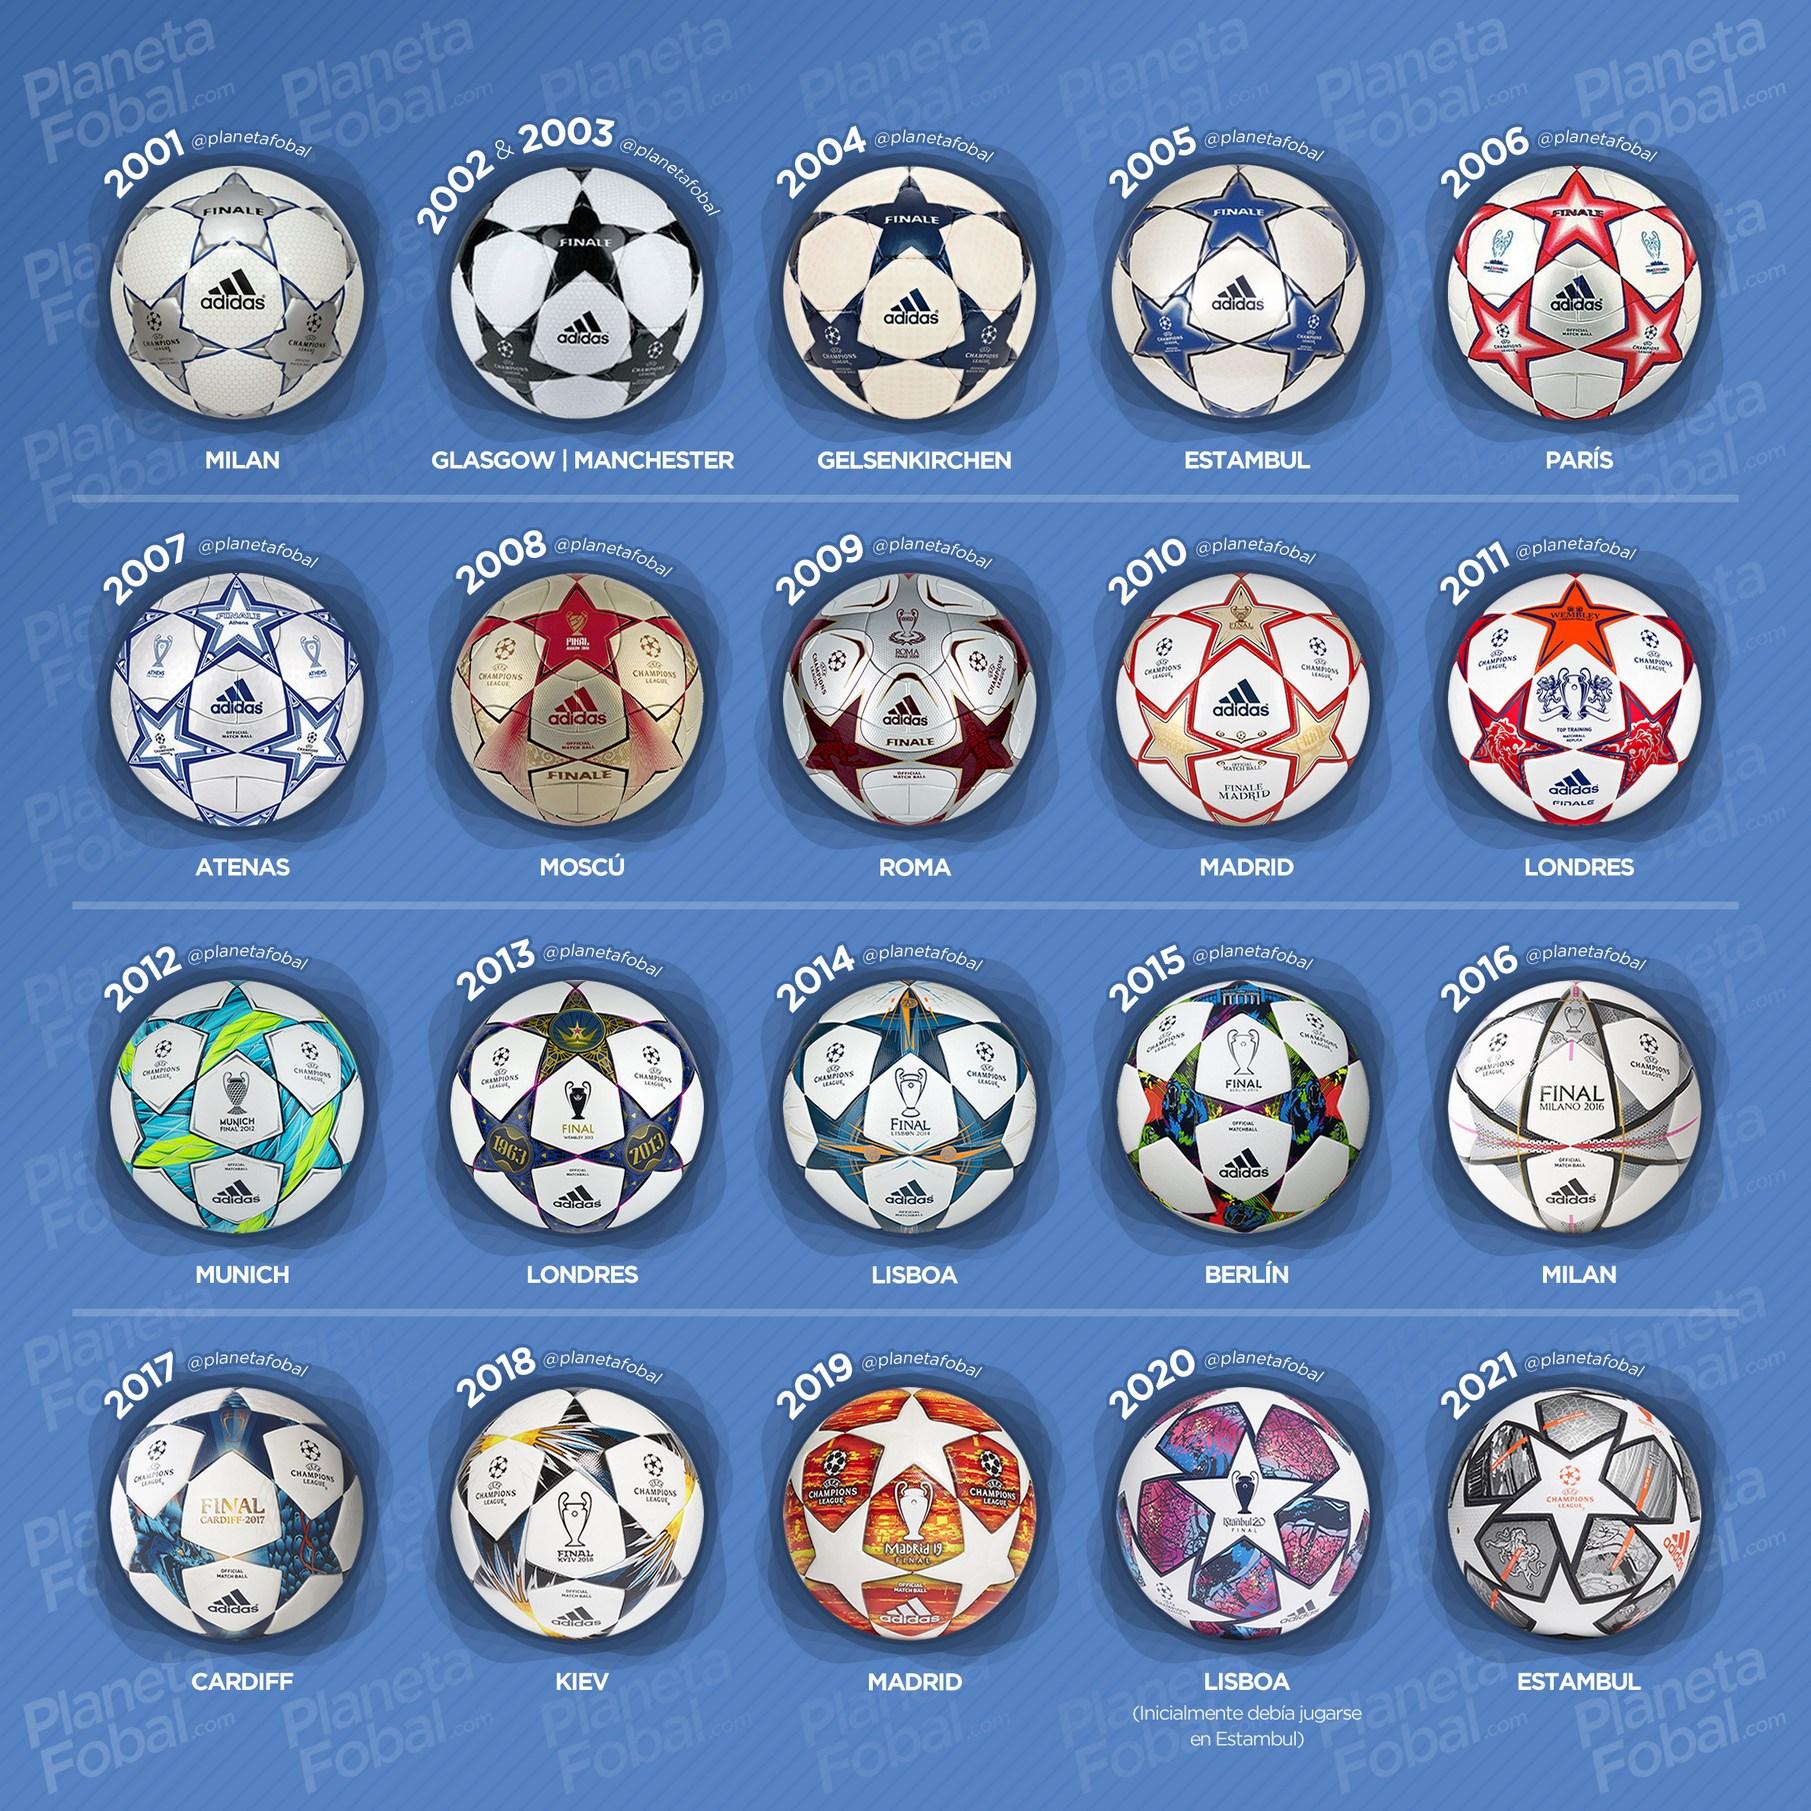 Evolución de la pelota adidas de la Champions League 2001-2020